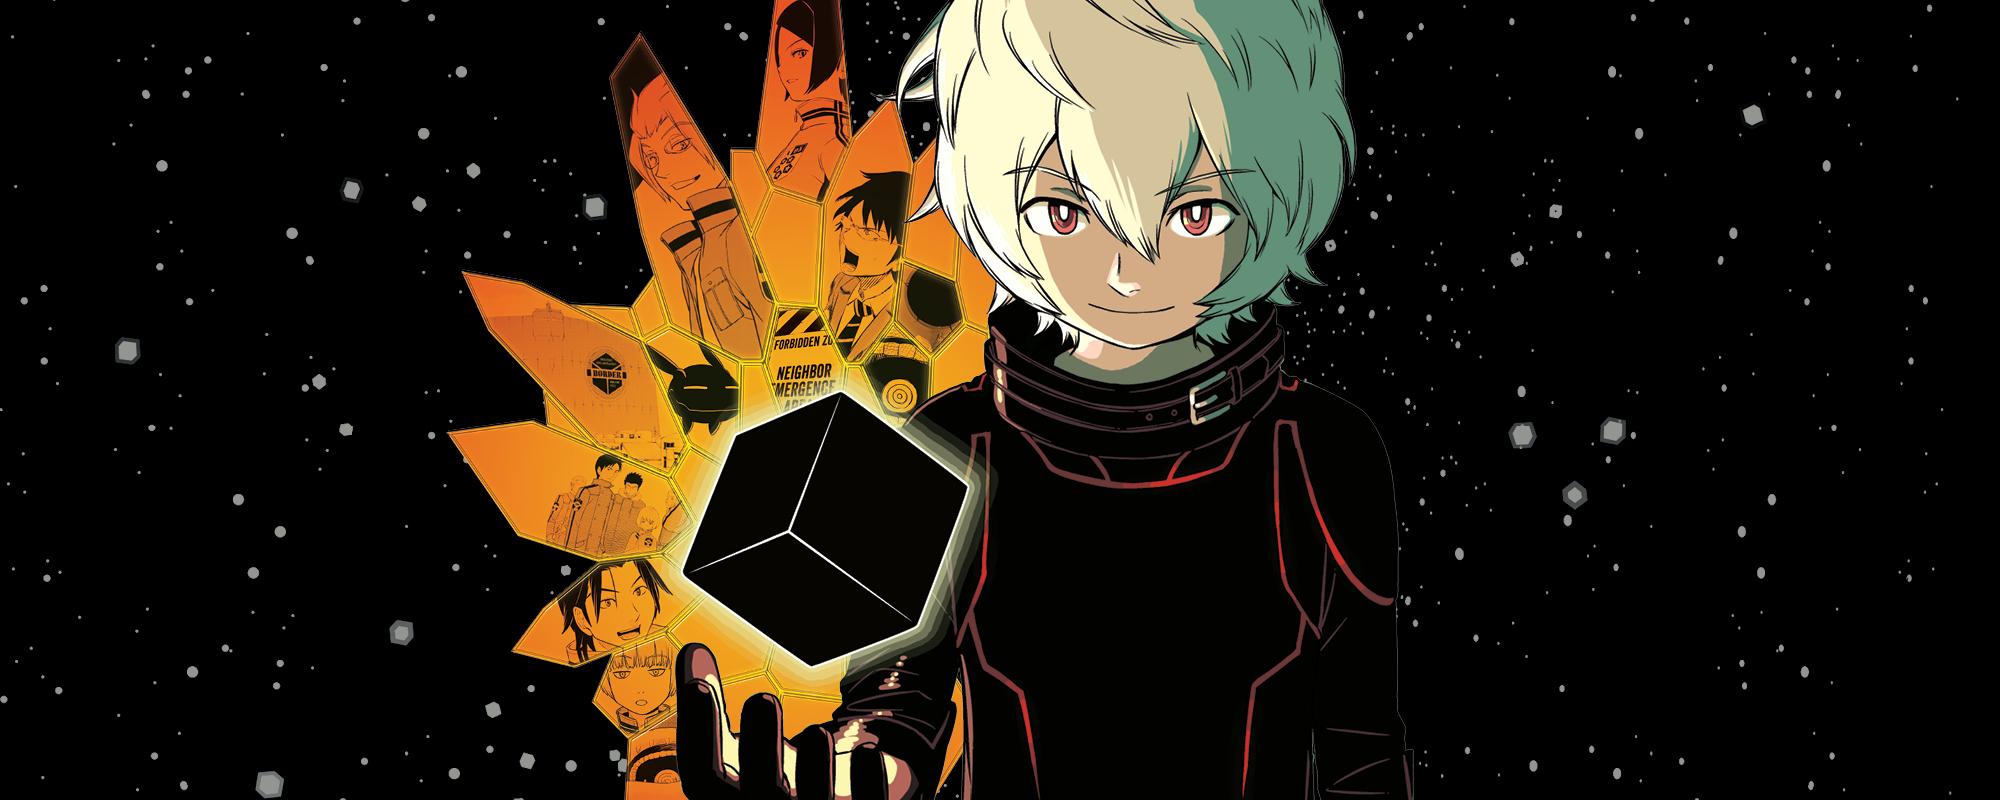 VIZ | Read World Trigger Manga Free - Official Shonen Jump